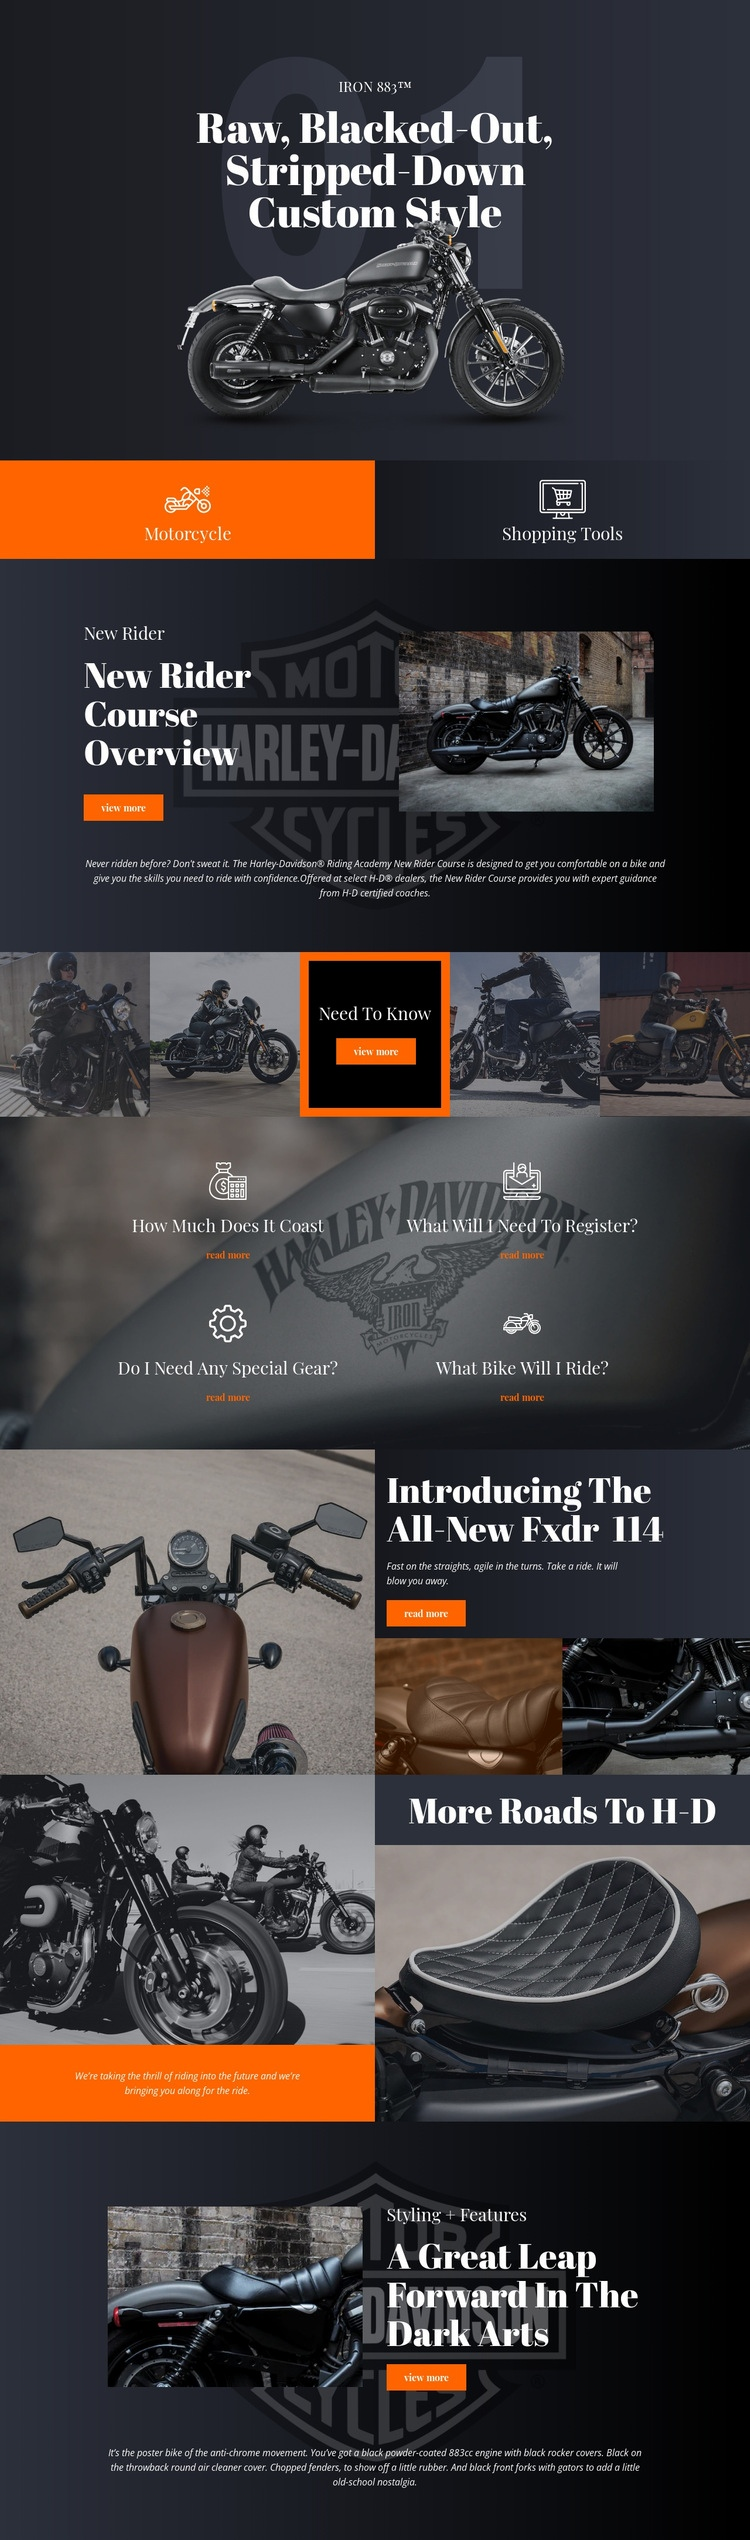 Harley Davidson Html Code